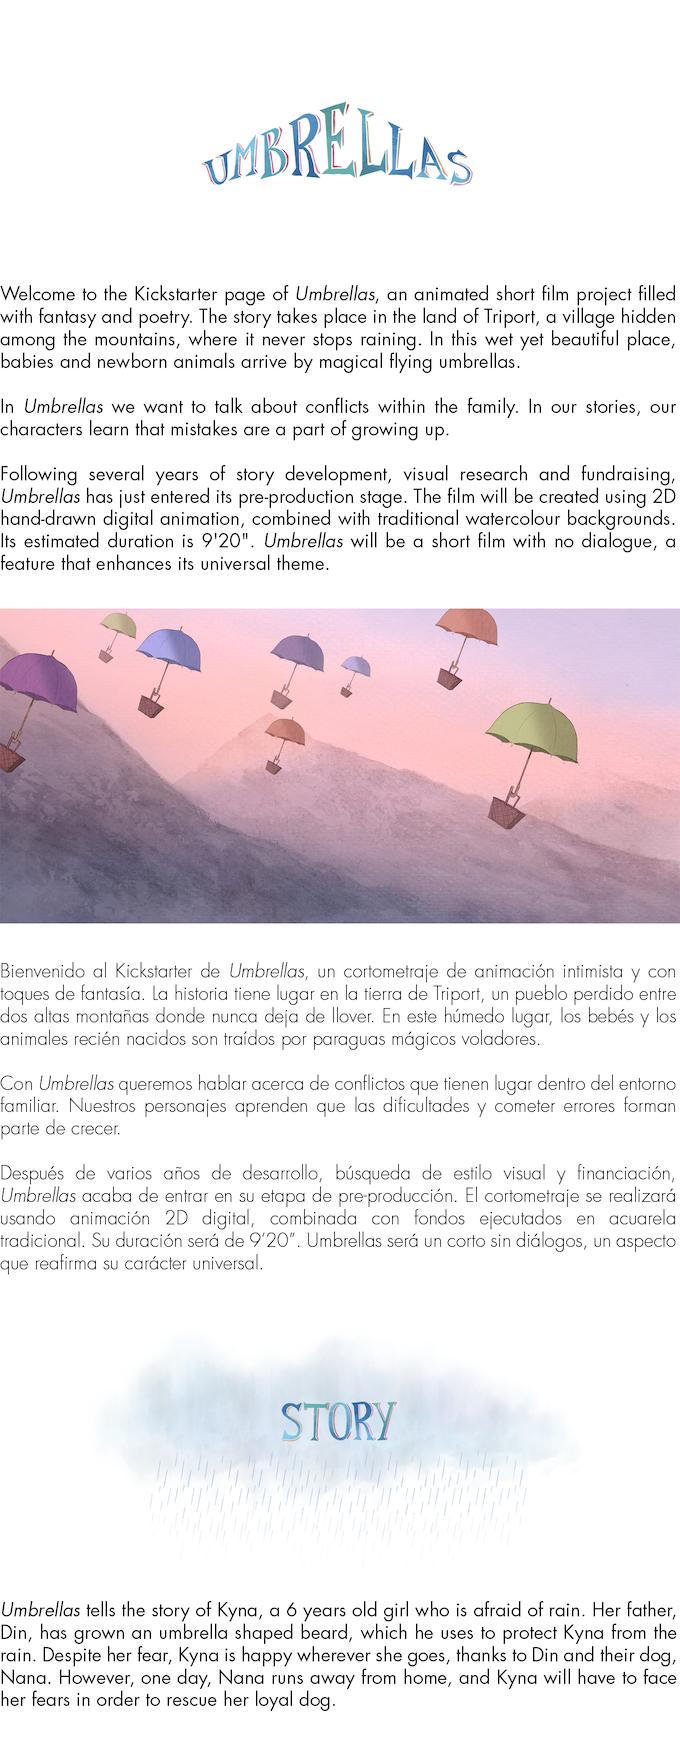 Umbrellas - an animated short film